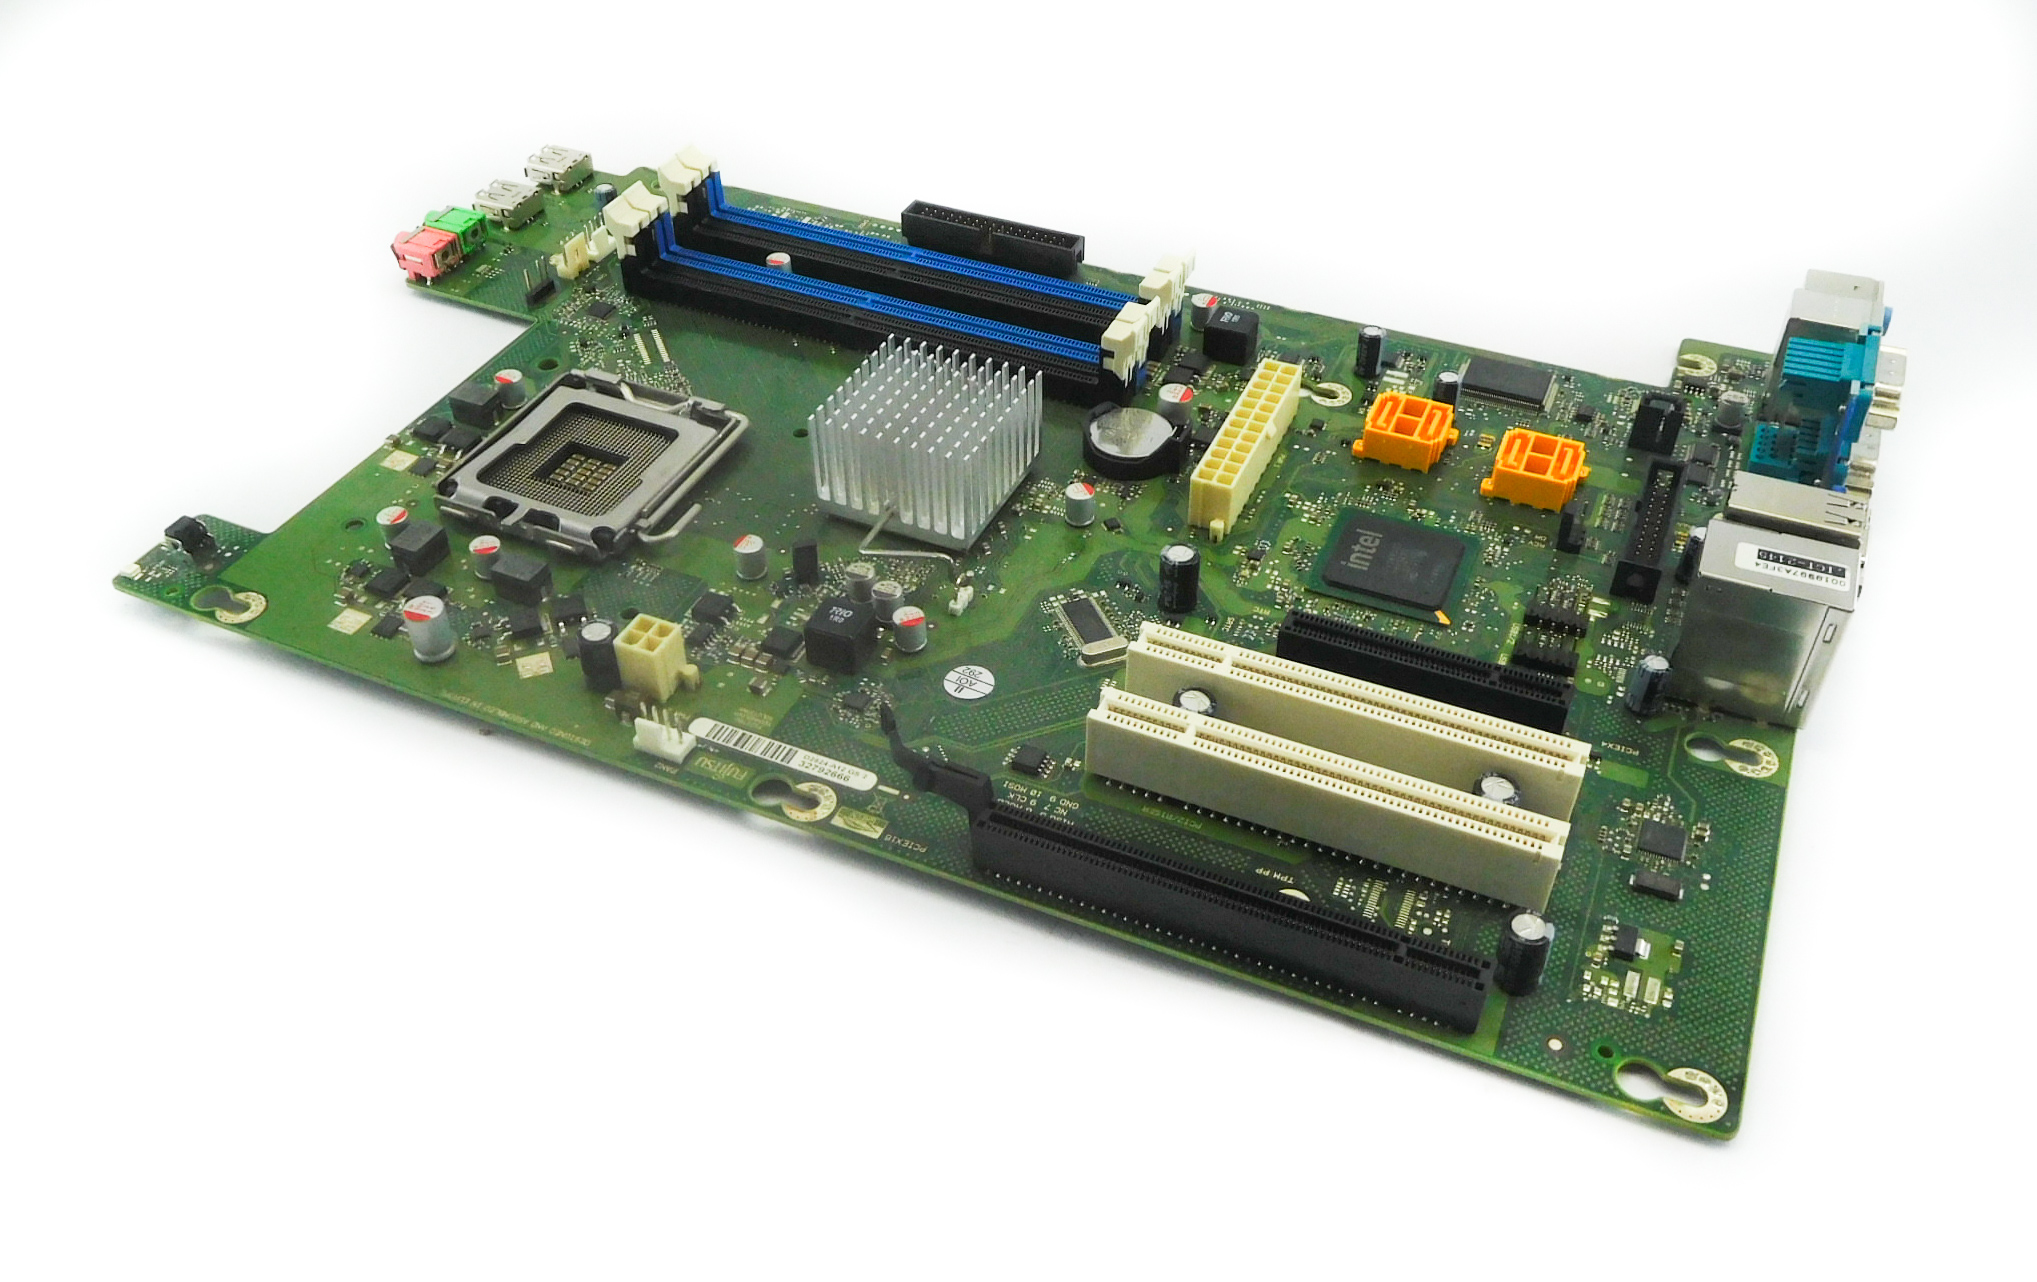 Fujitsu Esprimo Motherboard Socket 775 SFF D2824-A12 GS 2